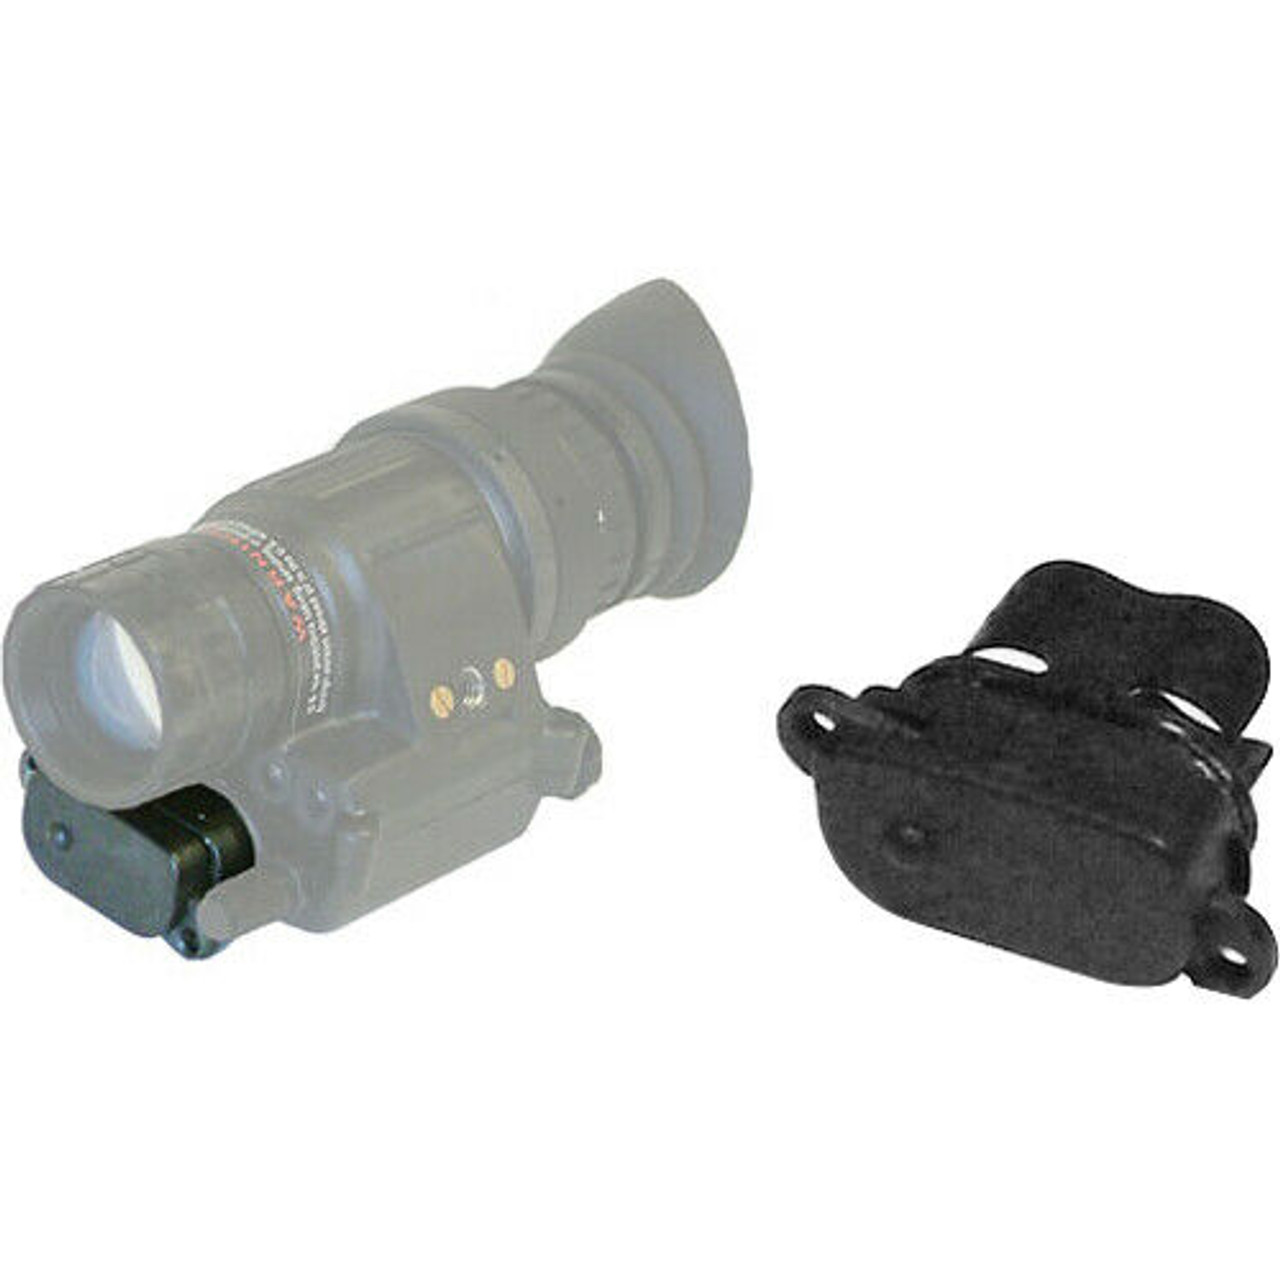 ITT LITTON L3 PVS-14 6015 Night Vision Monocular Dual Battery Cartridge A3256344